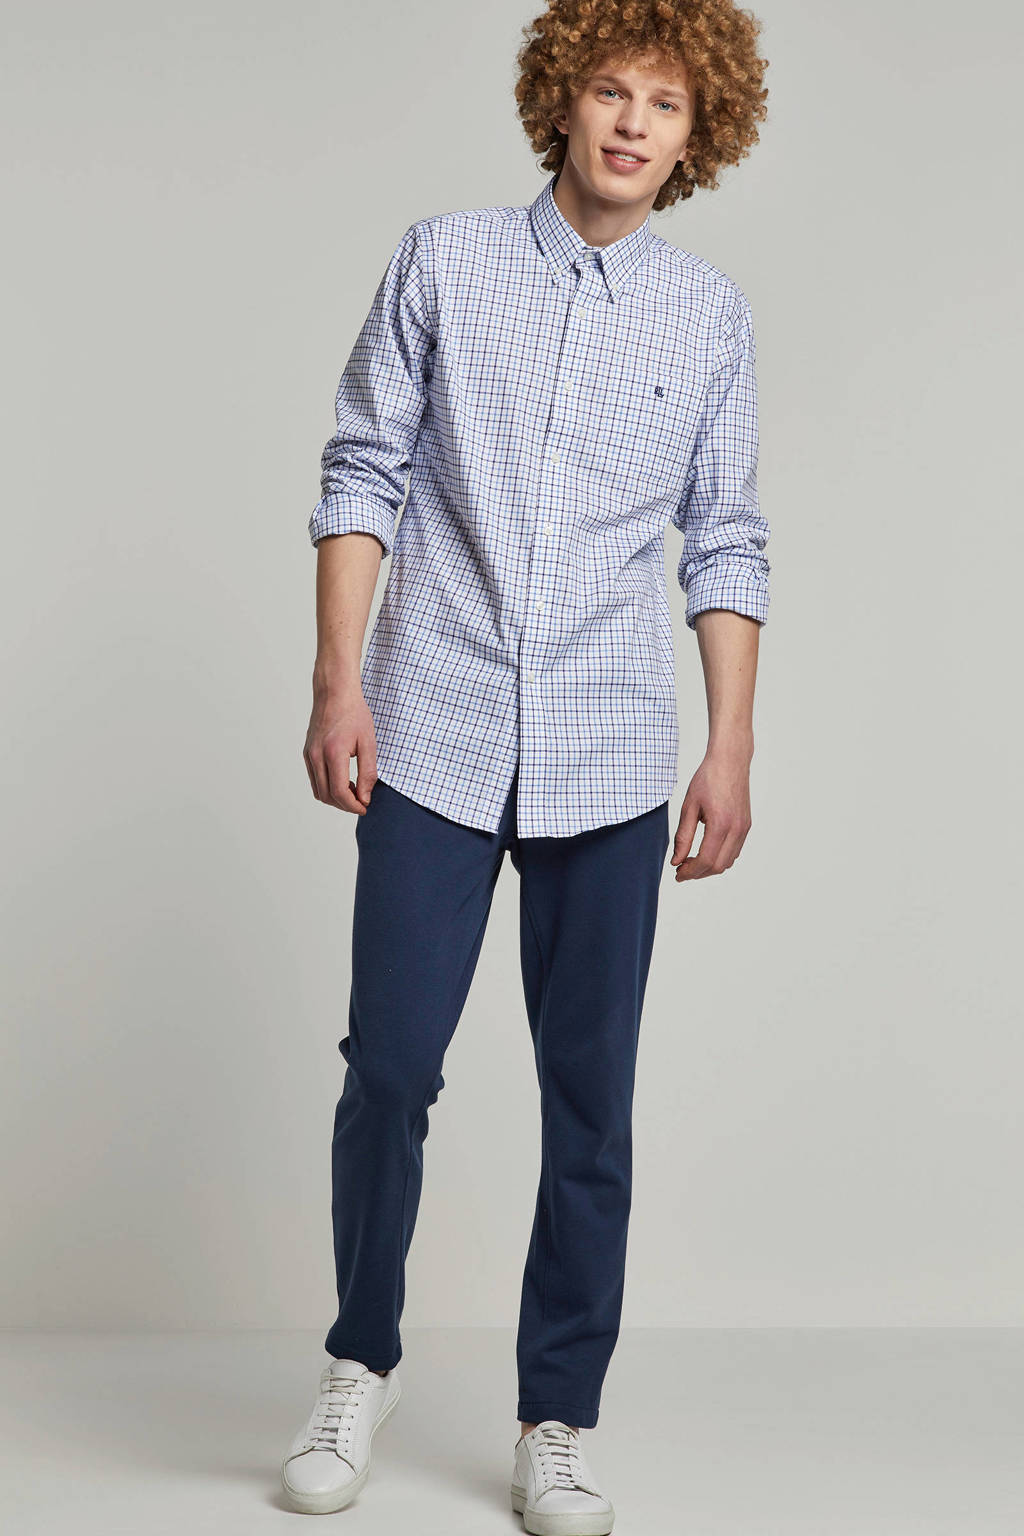 POLO Ralph Lauren geruit slim fit overhemd blauw, Wit/blauw